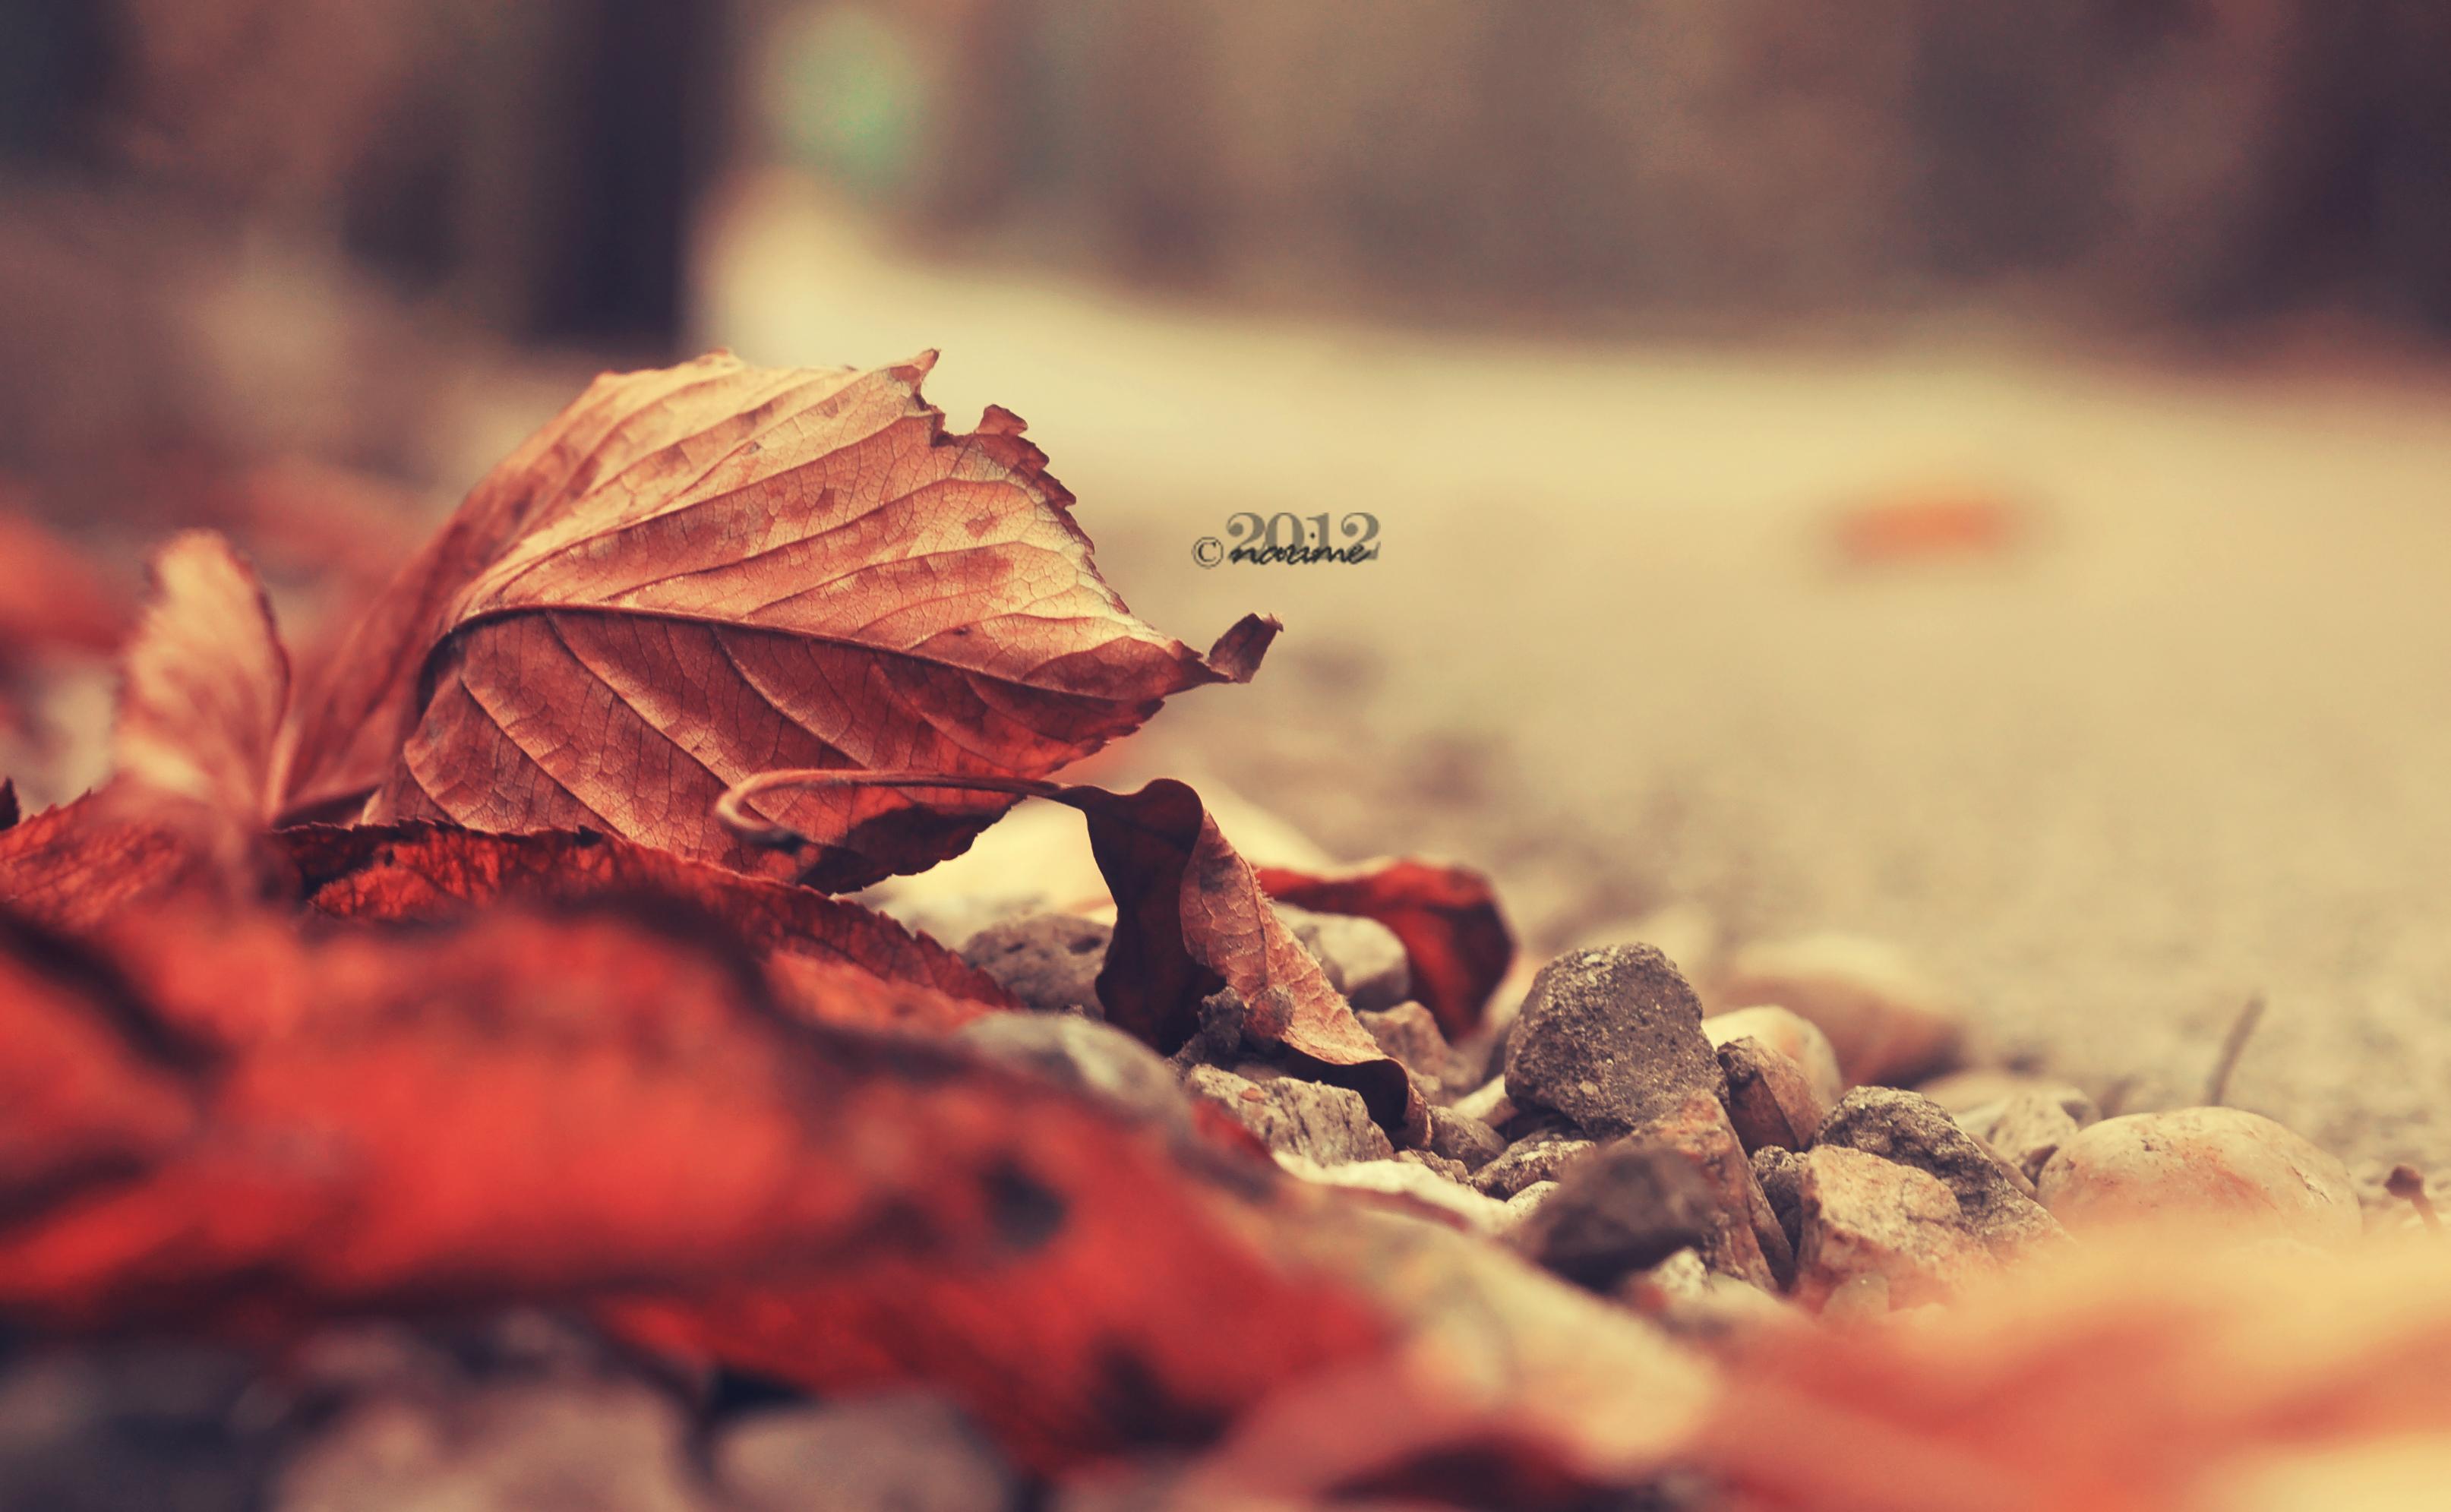 Fallen Leaves by nari-me